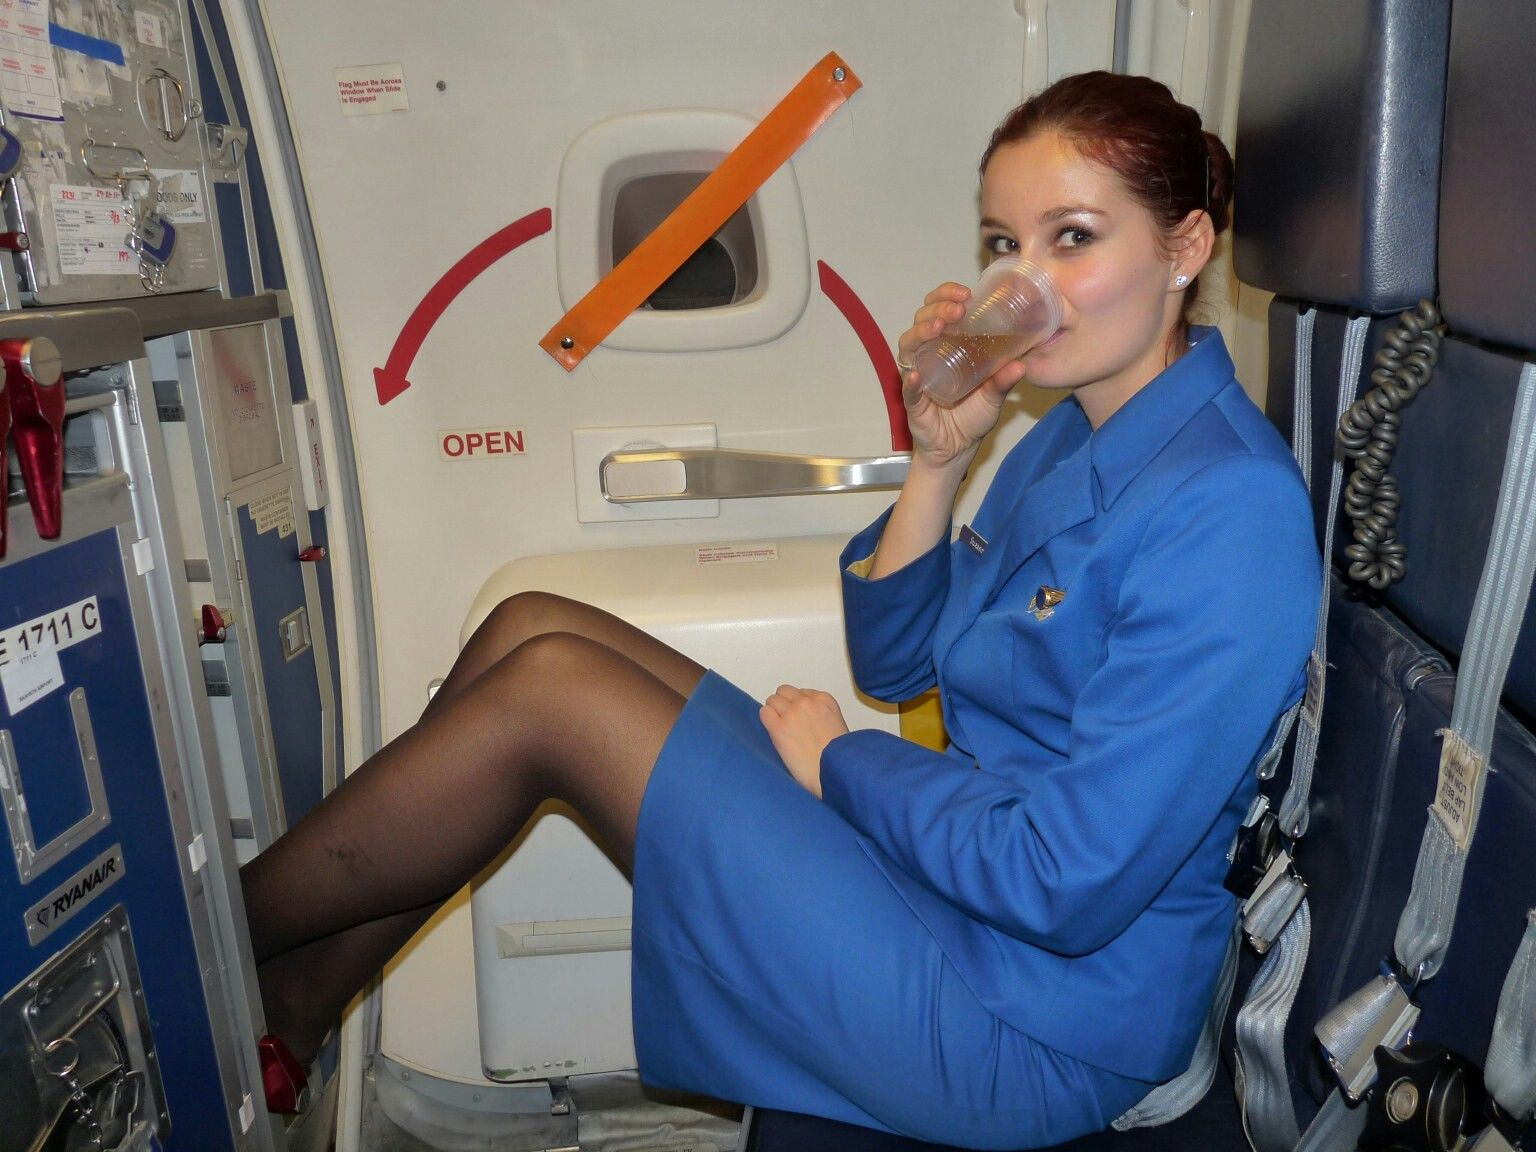 Фото стюардесса ххх, Голые стюардессы - Лучшее фото 22 фотография